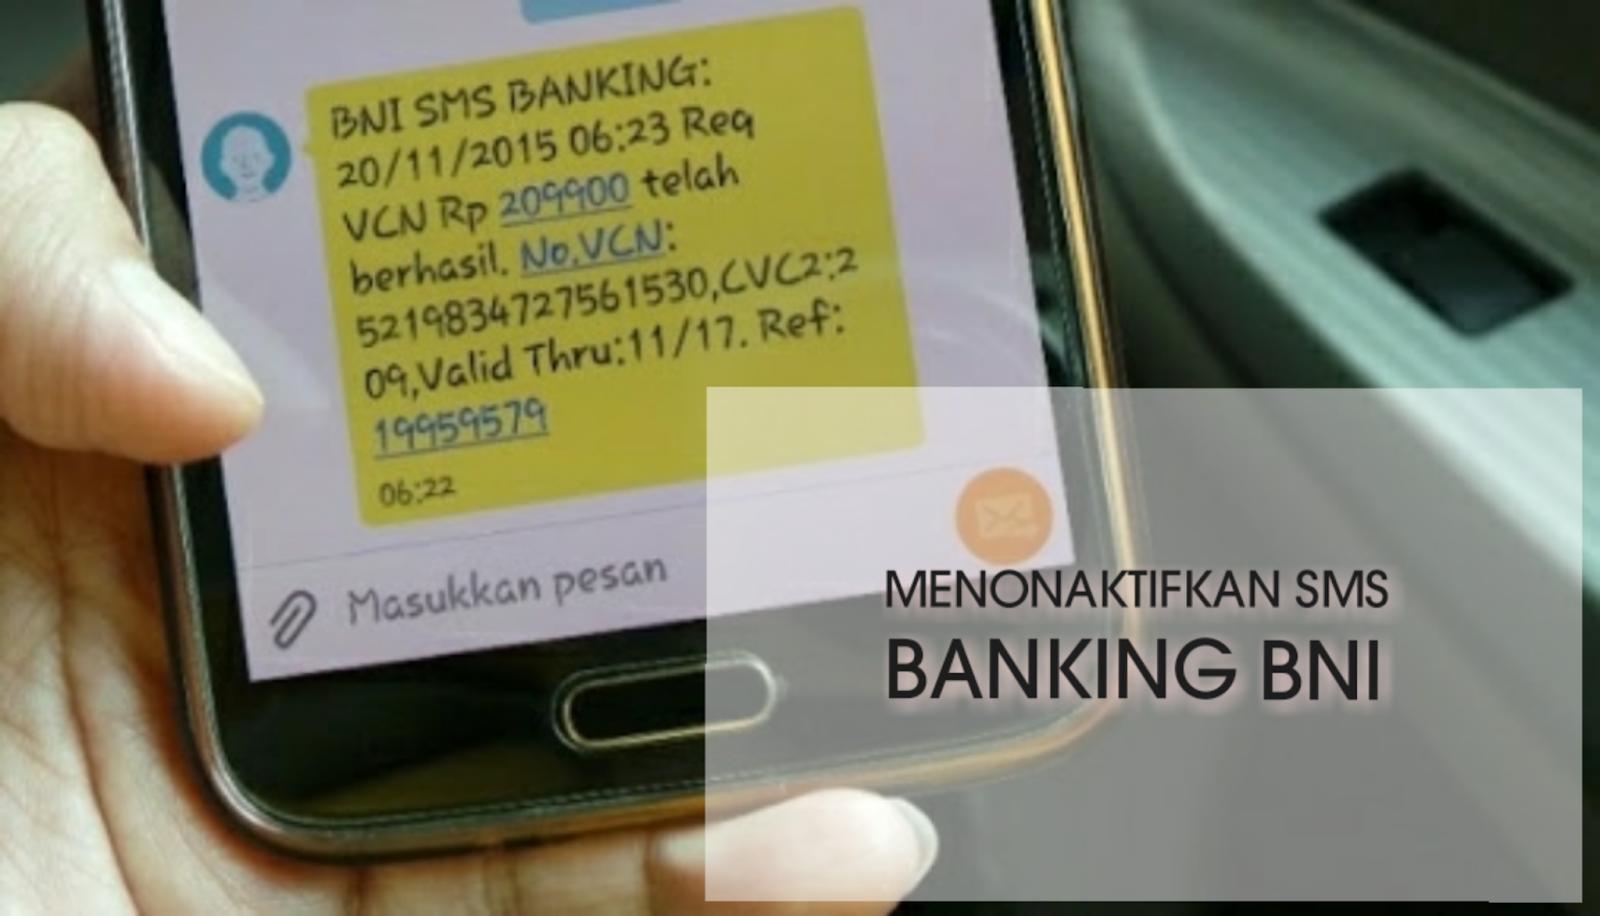 Cara menonaktifkan sms banking BNI